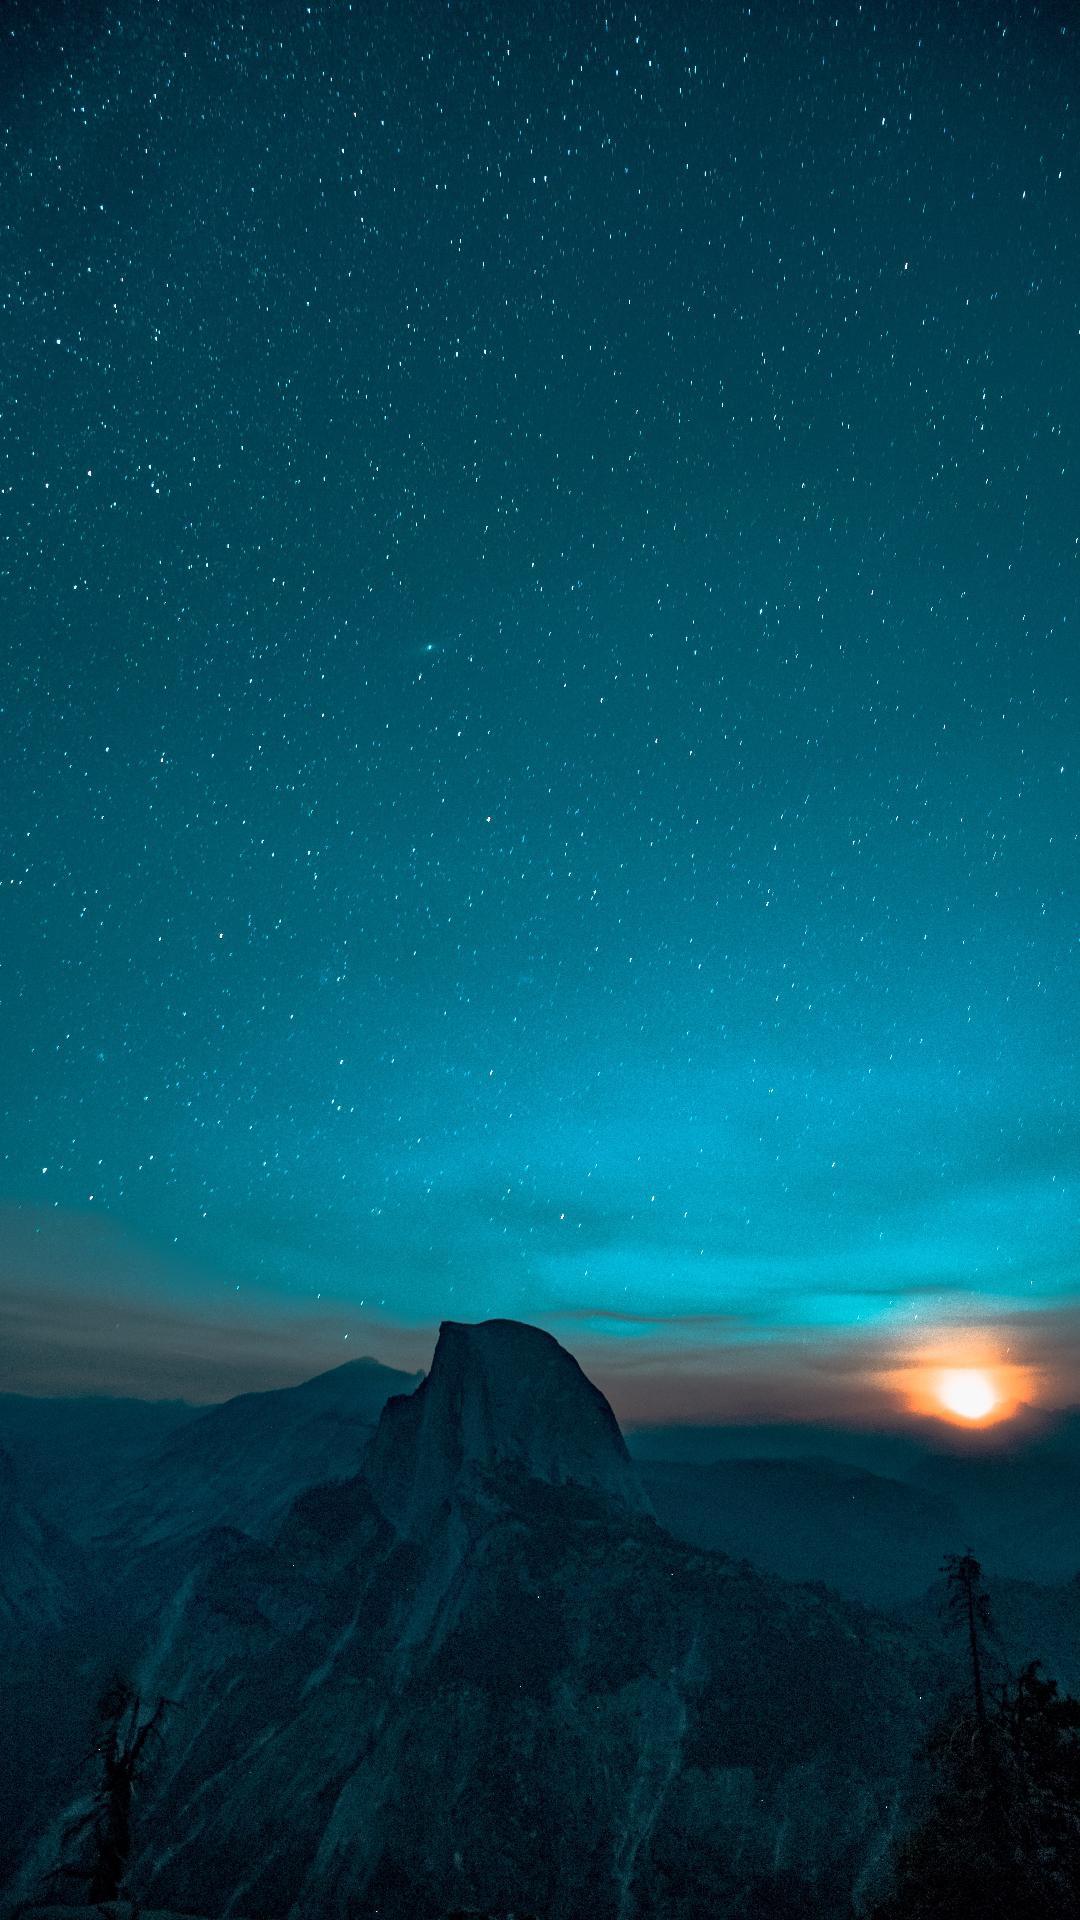 Cute Wallpapers For Lg Phones Yosemite National Park Night Sky Iphone Wallpaper Iphone